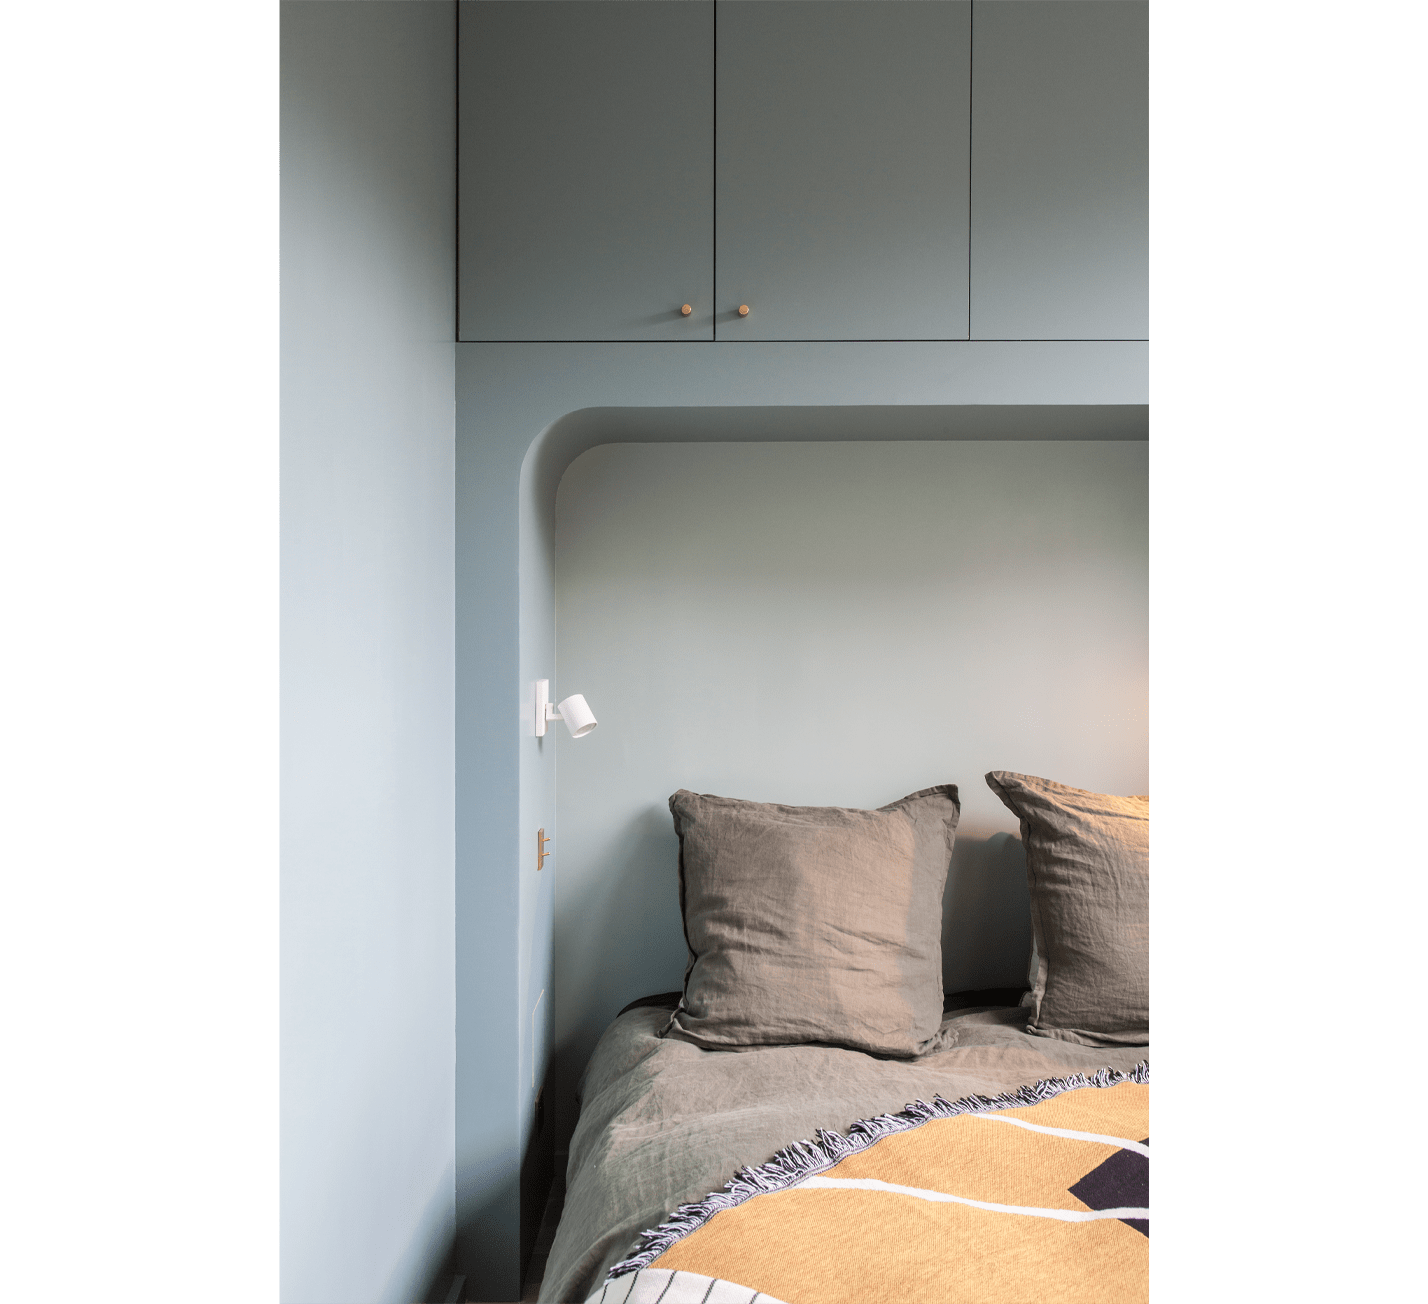 Projet-Albert-Atelier-Steve-Pauline-Borgia-Architecte-interieur-06-min-1